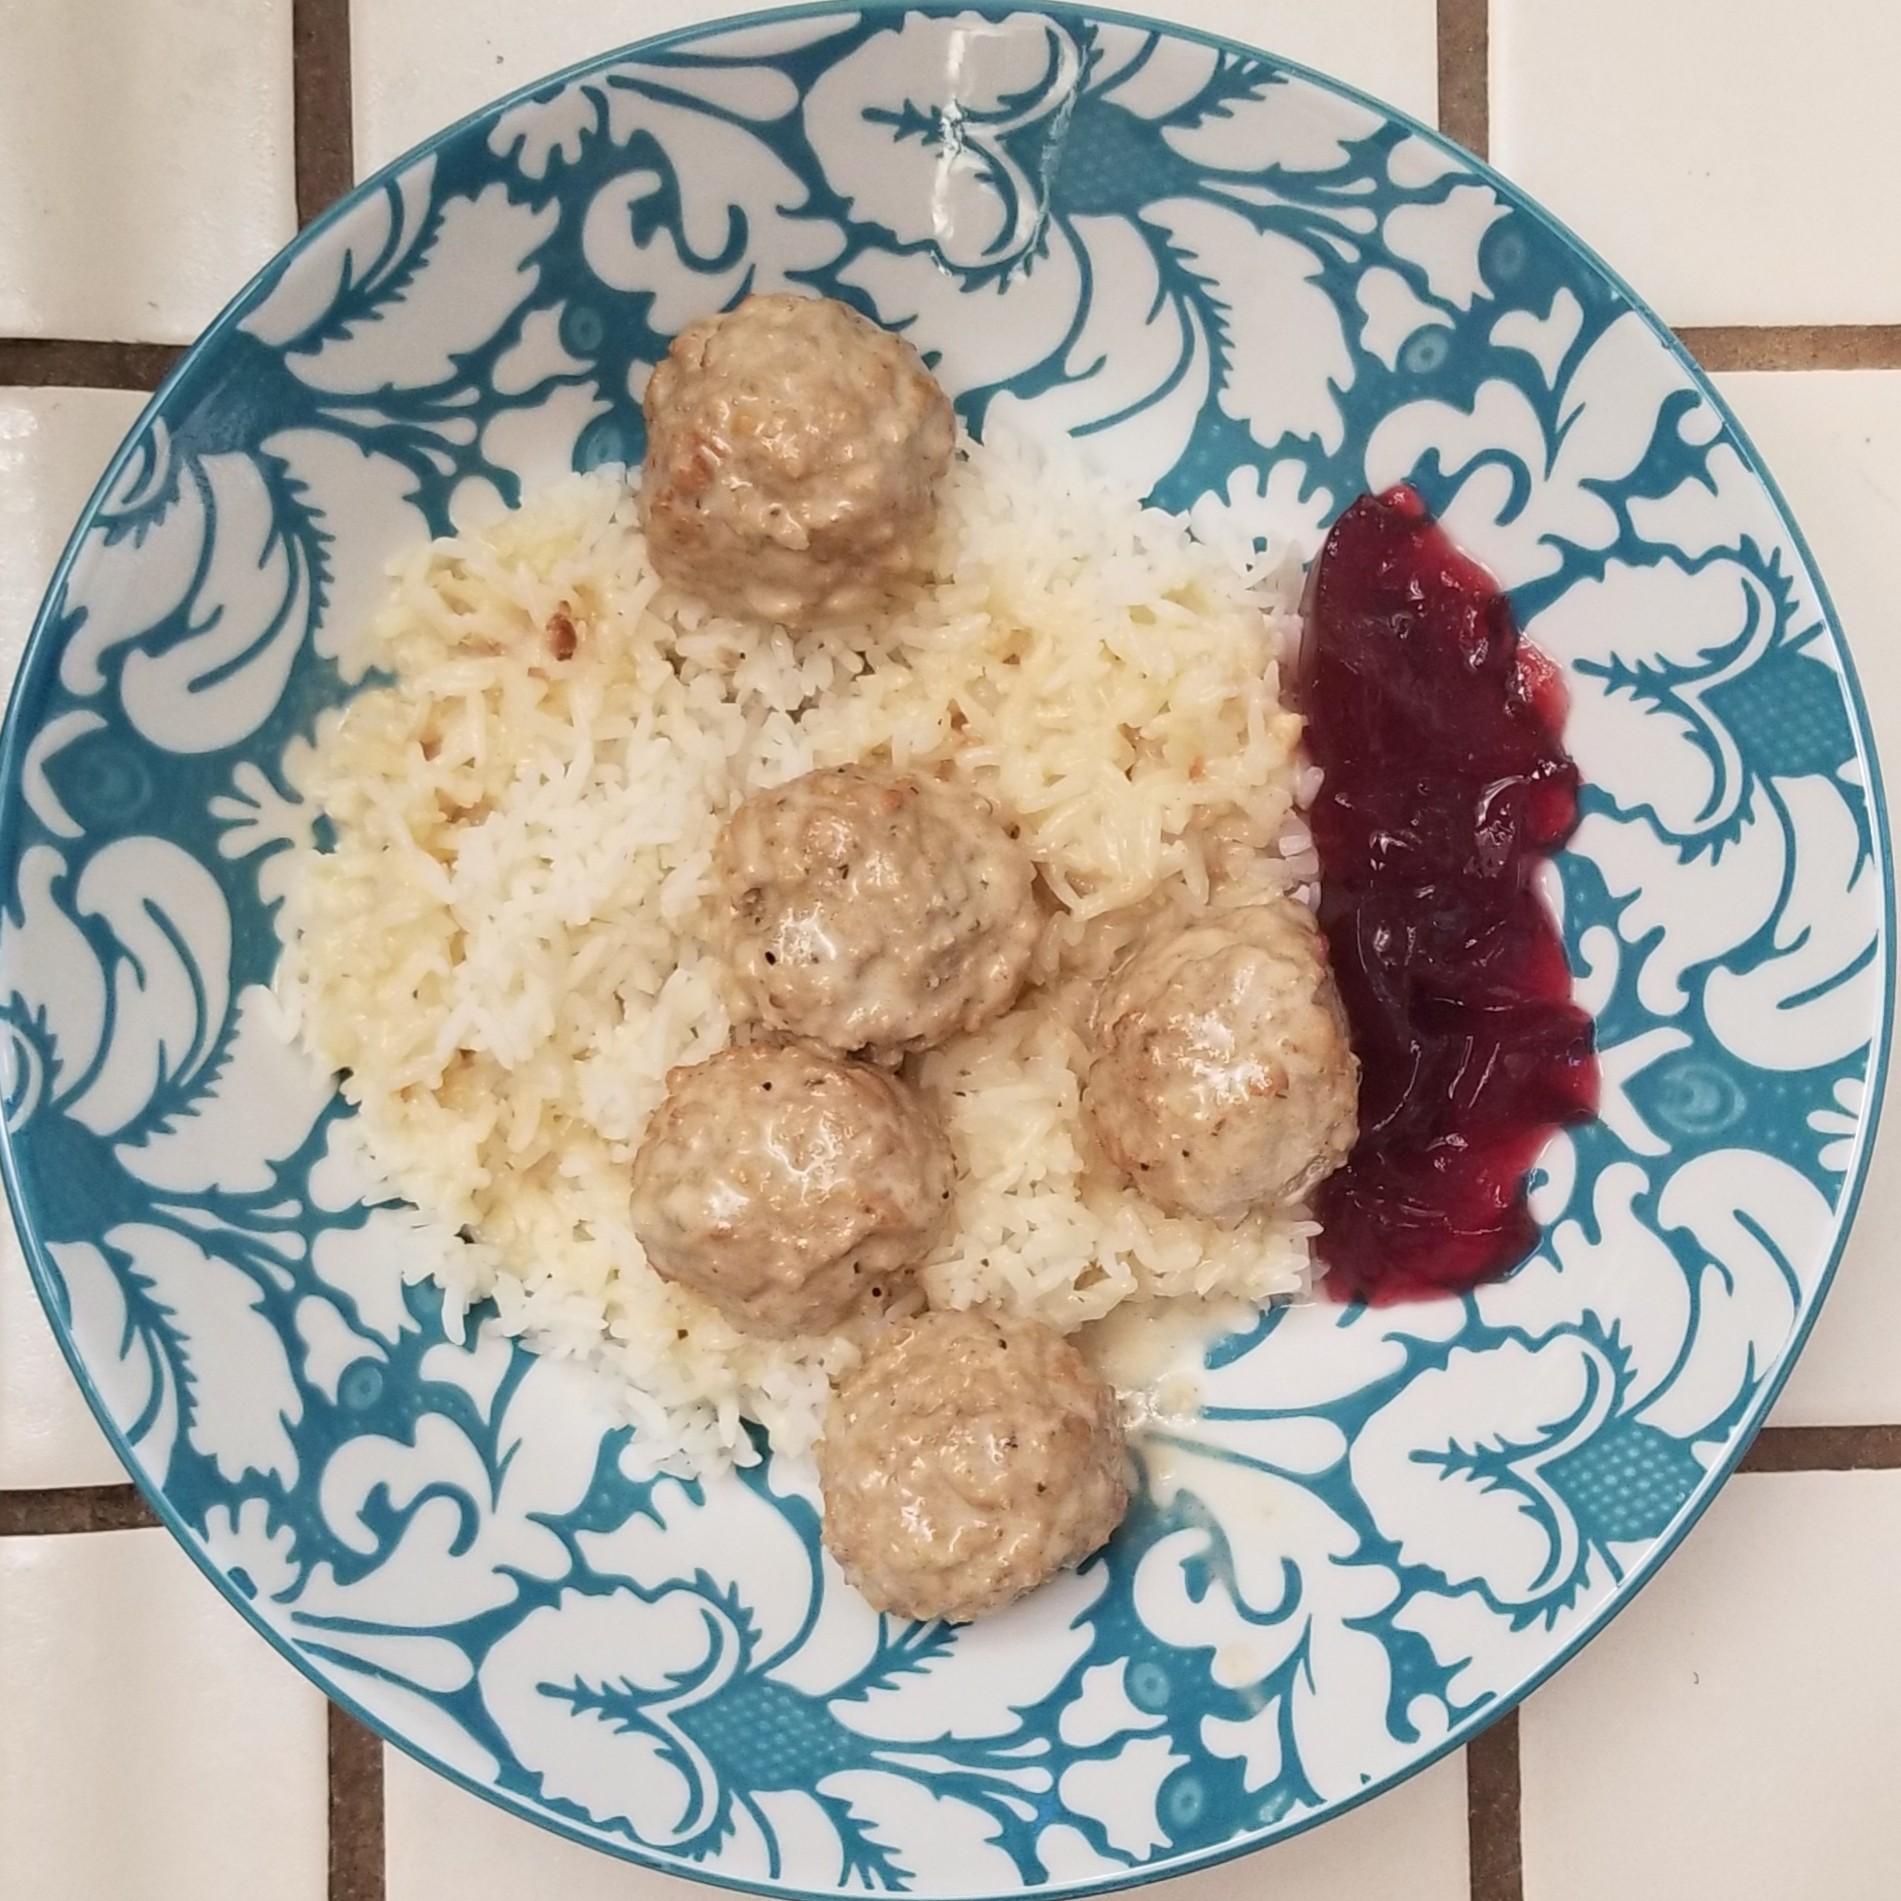 Swedish meatballs on Jasmine rice with a little cranberry sauce.